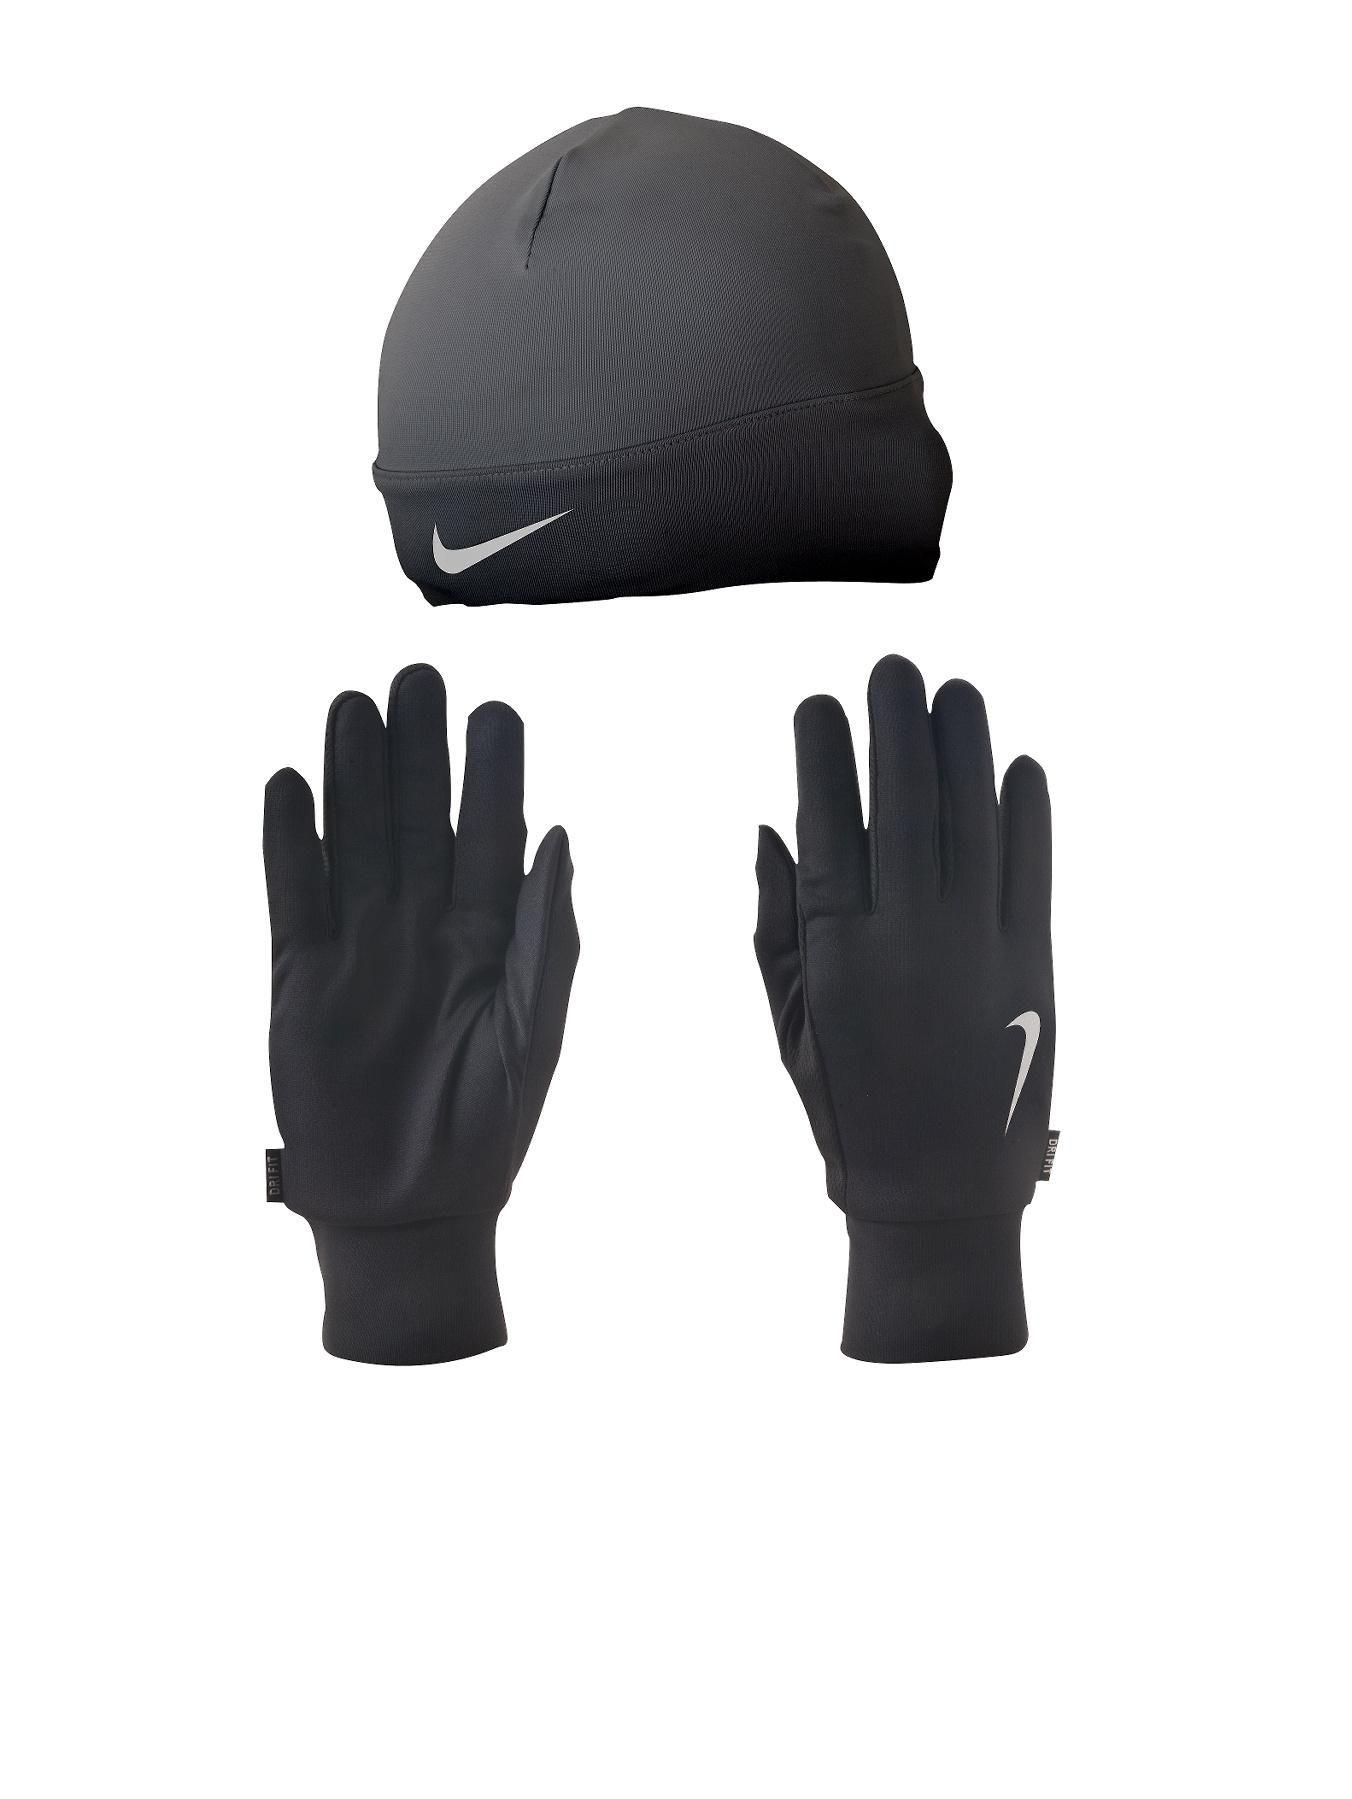 Nike Mens Running Dri-Fit Gloves and Beanie Set  9996a31091b2